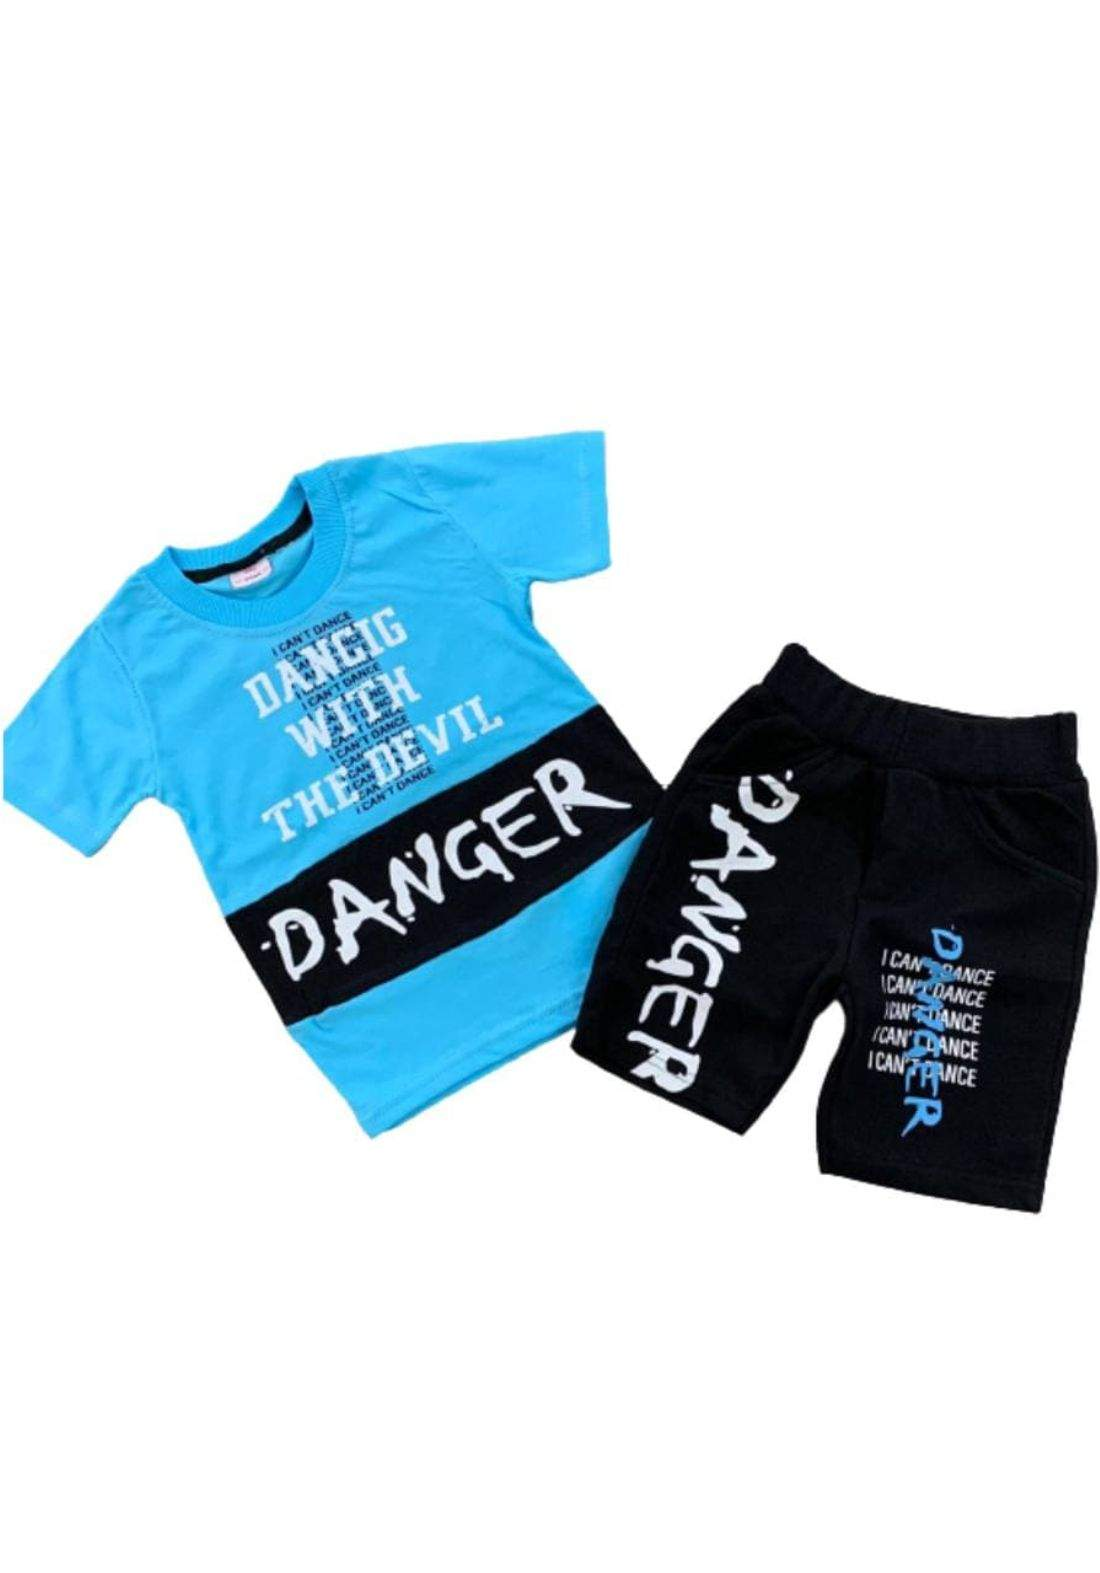 tracksuit for boys blue  (t-shirt+short) ( تراكسوت ولادي سمائي  (شورت و تيشيرت